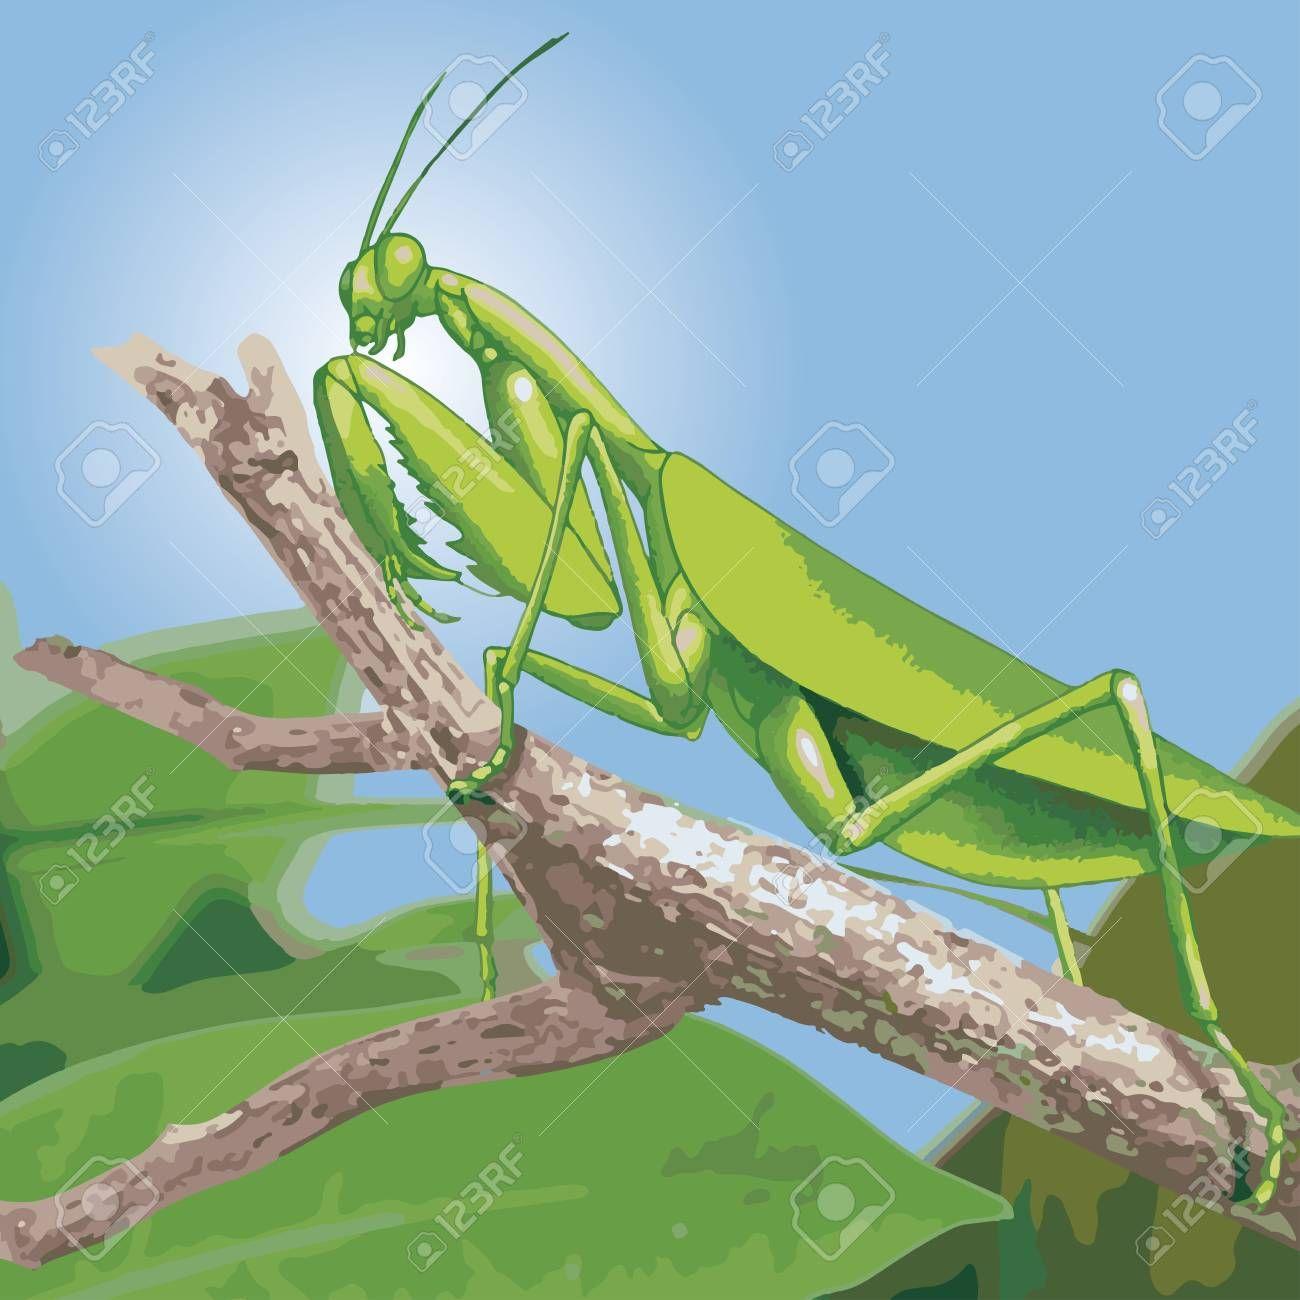 Green Praying Mantis Vector Illustration Spon Praying Green Mantis Illus Photography Magazine Template Ink Drawing Illustration Vector Illustration